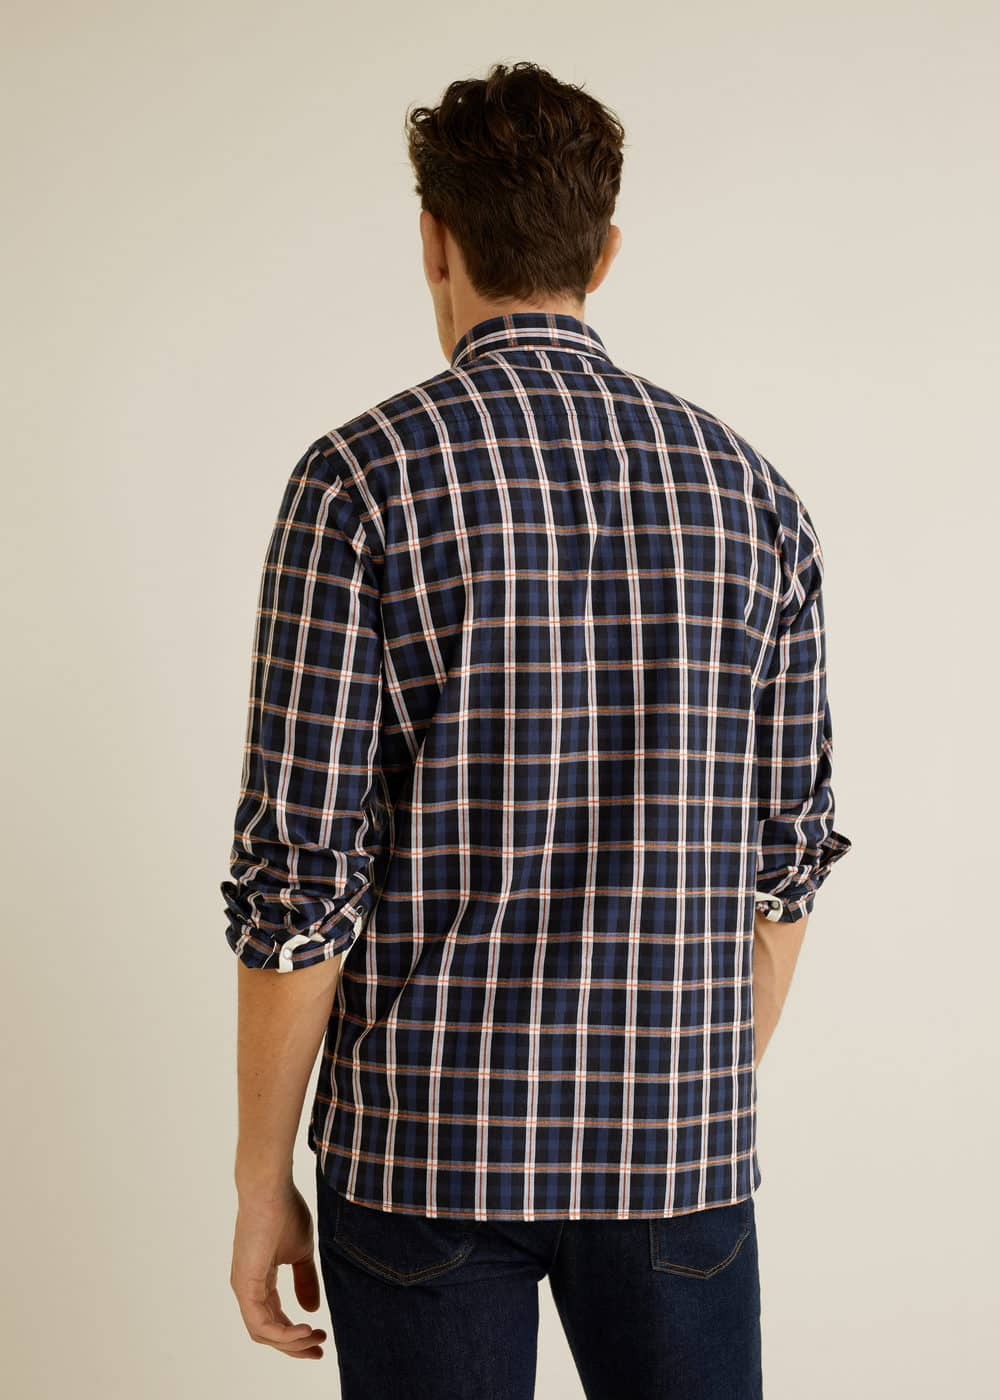 Mango - Camisa slim-fit algodón cuadros - 3